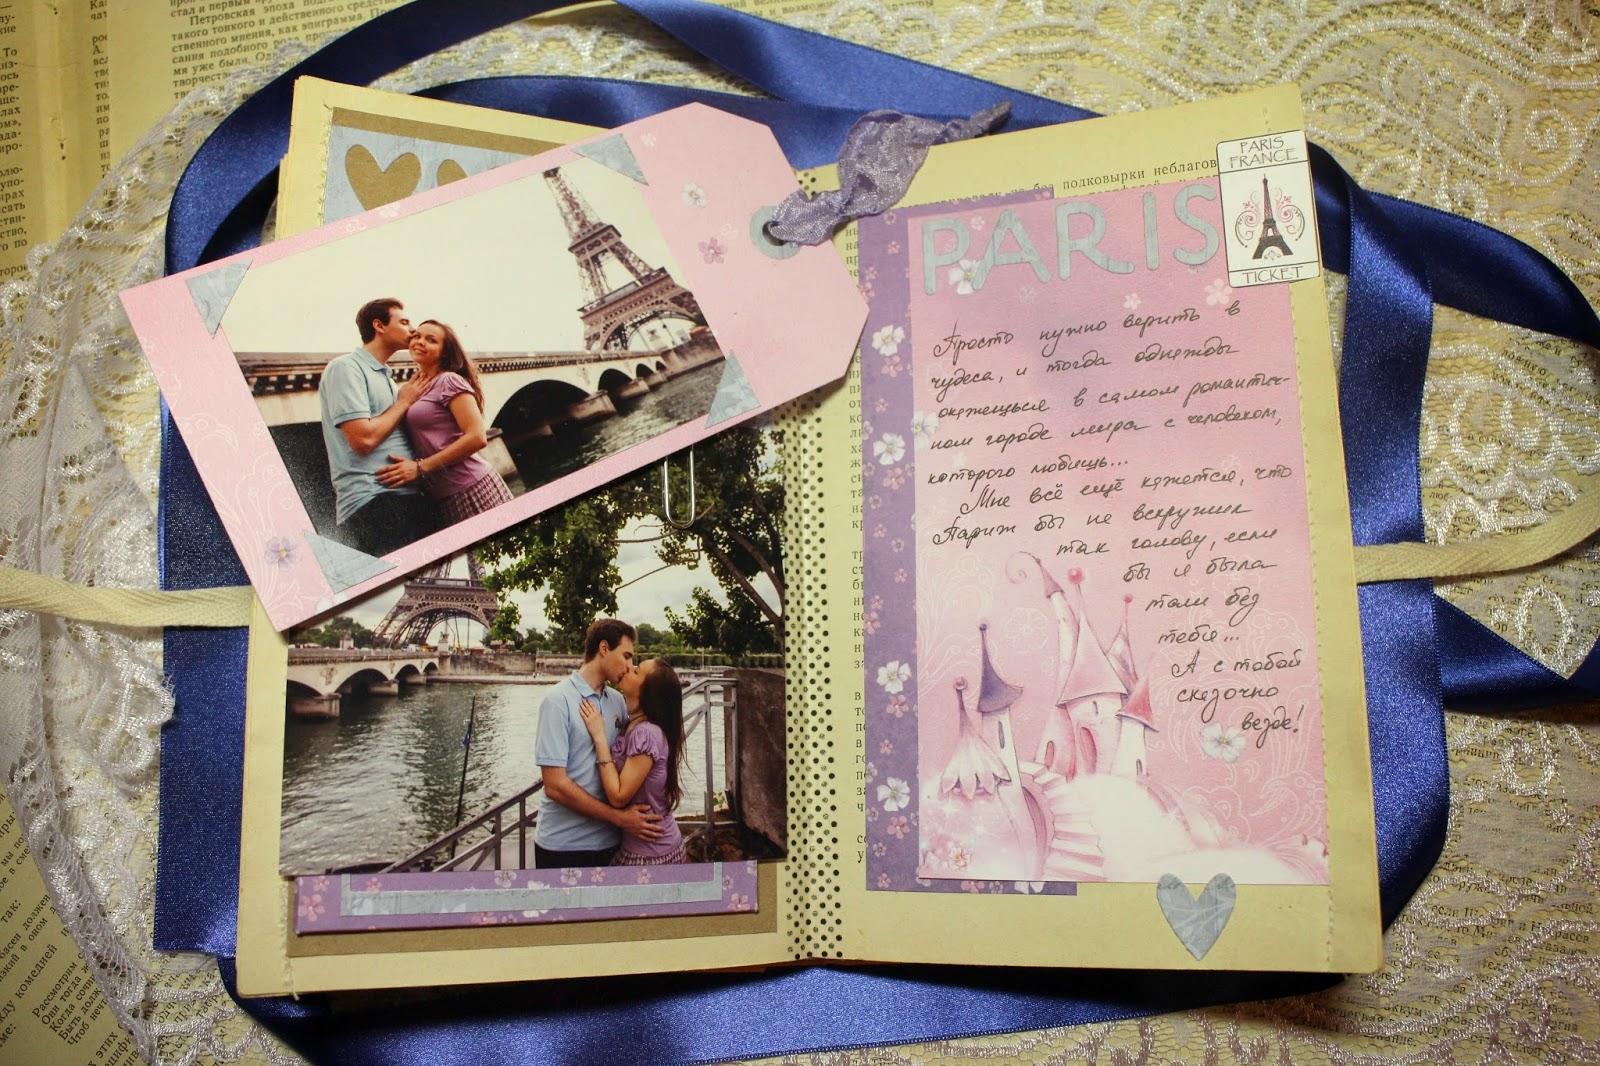 album in a book scrapbooking 2 years together love memories альбом в книге 2 года вместе годовщина скрапбукинг hamster-sensey